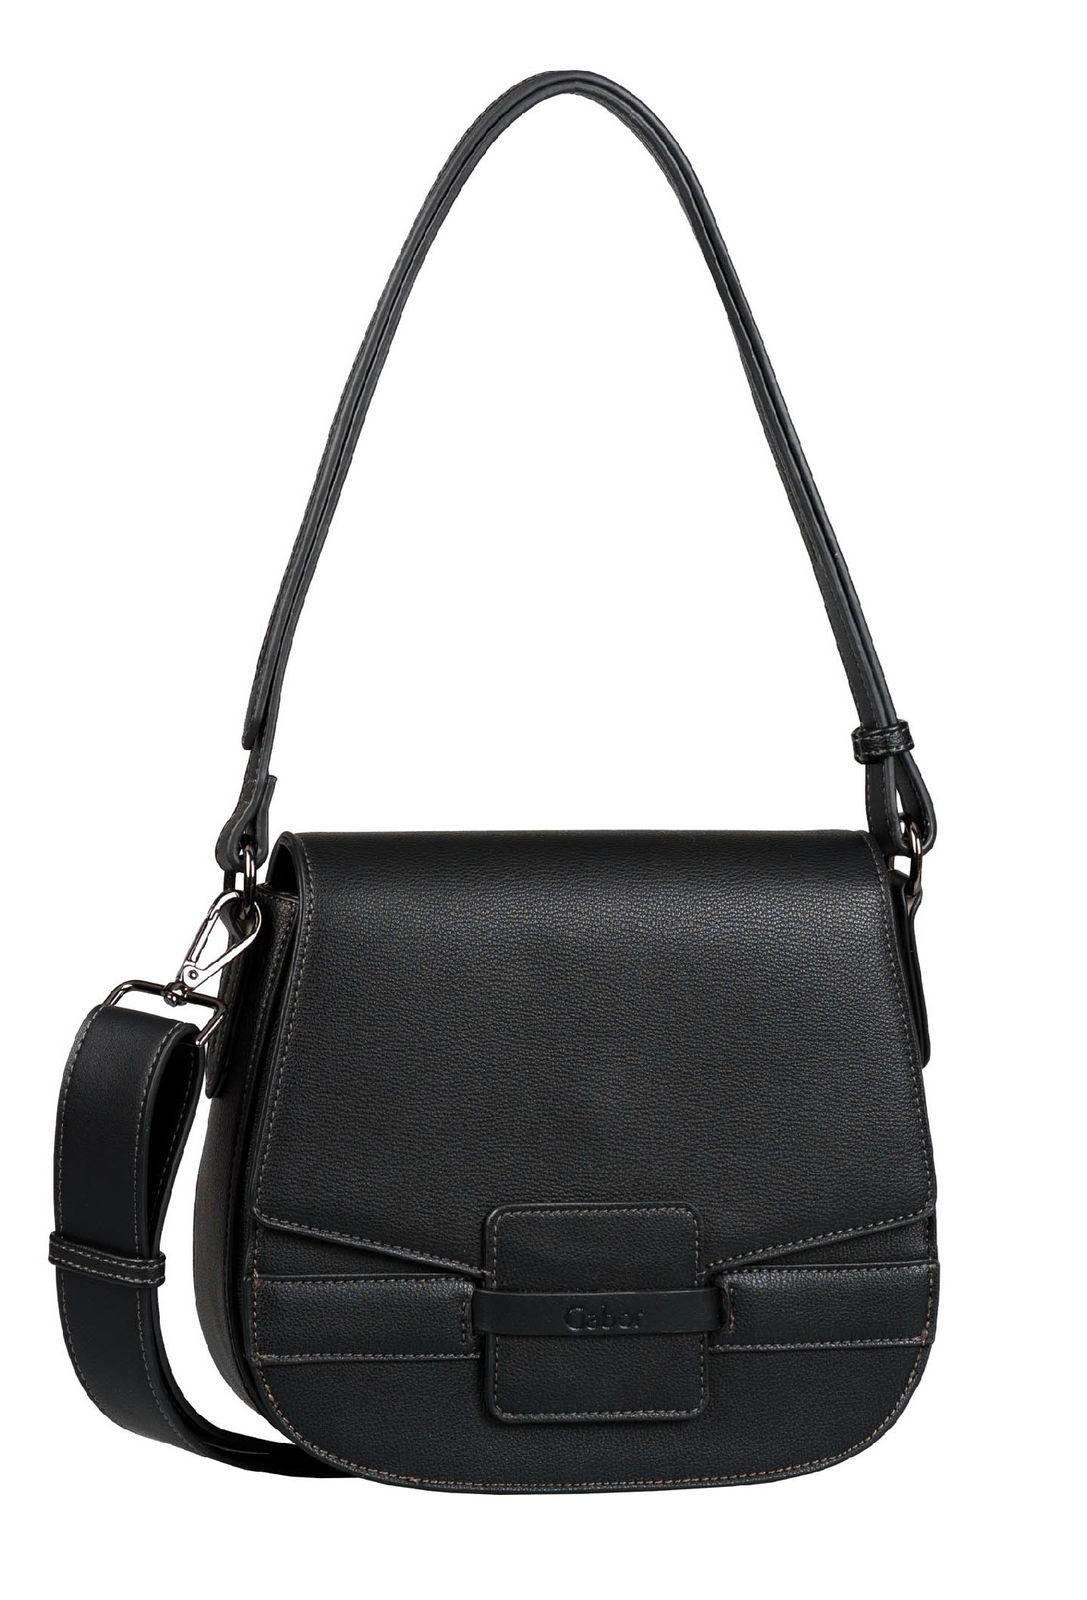 Gabor Adora Flap Bag M Black